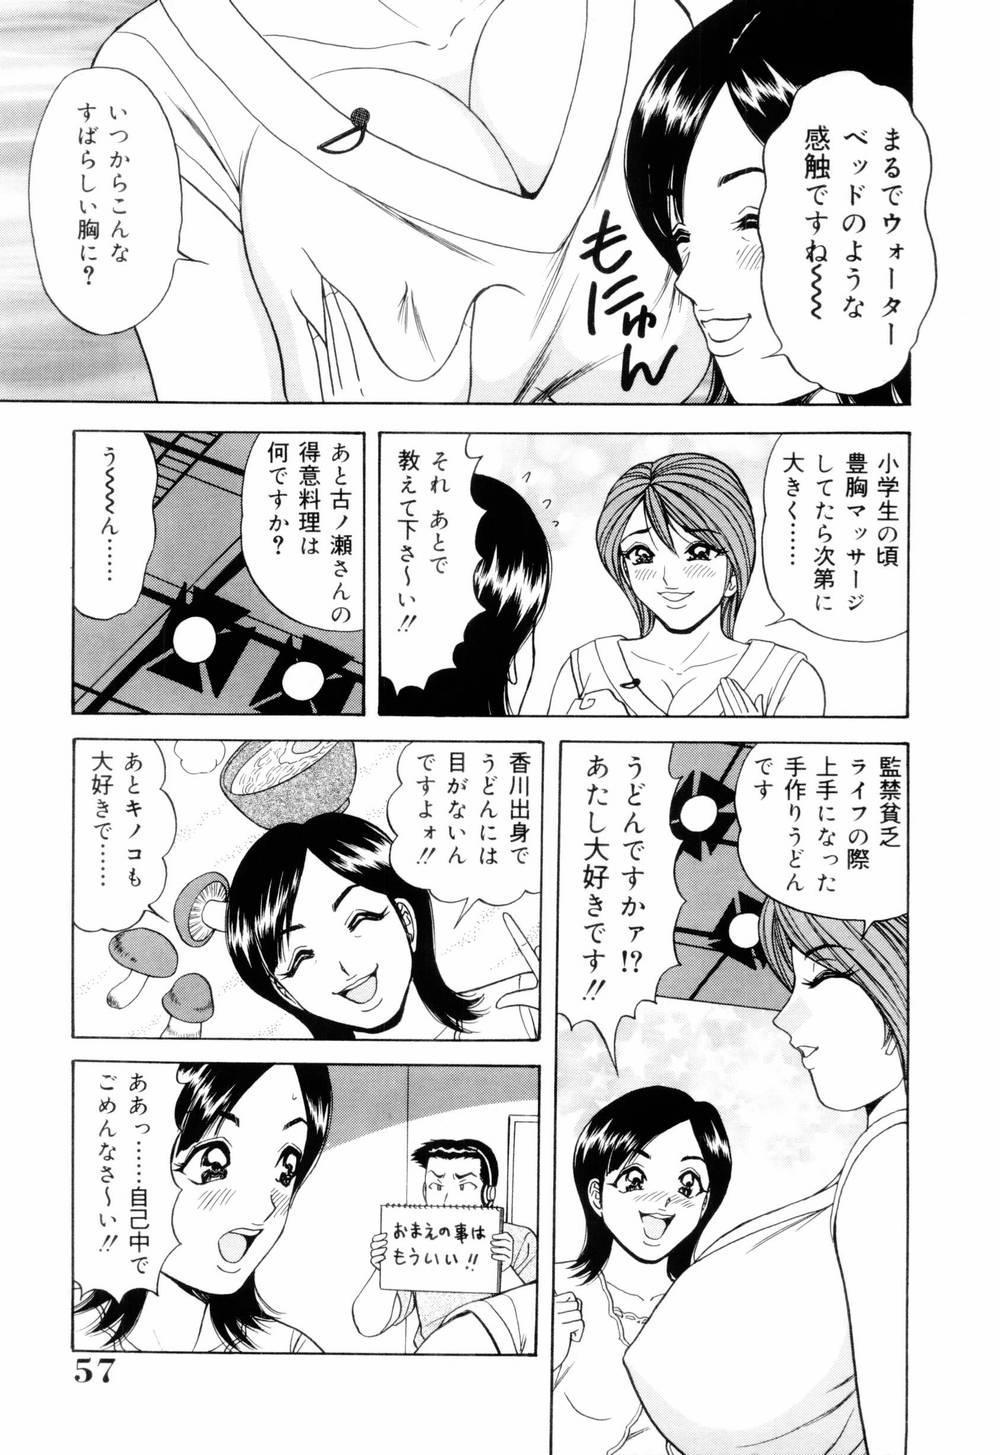 SuiCup Joshi Announcer Jikkyo Chukei Rape 60